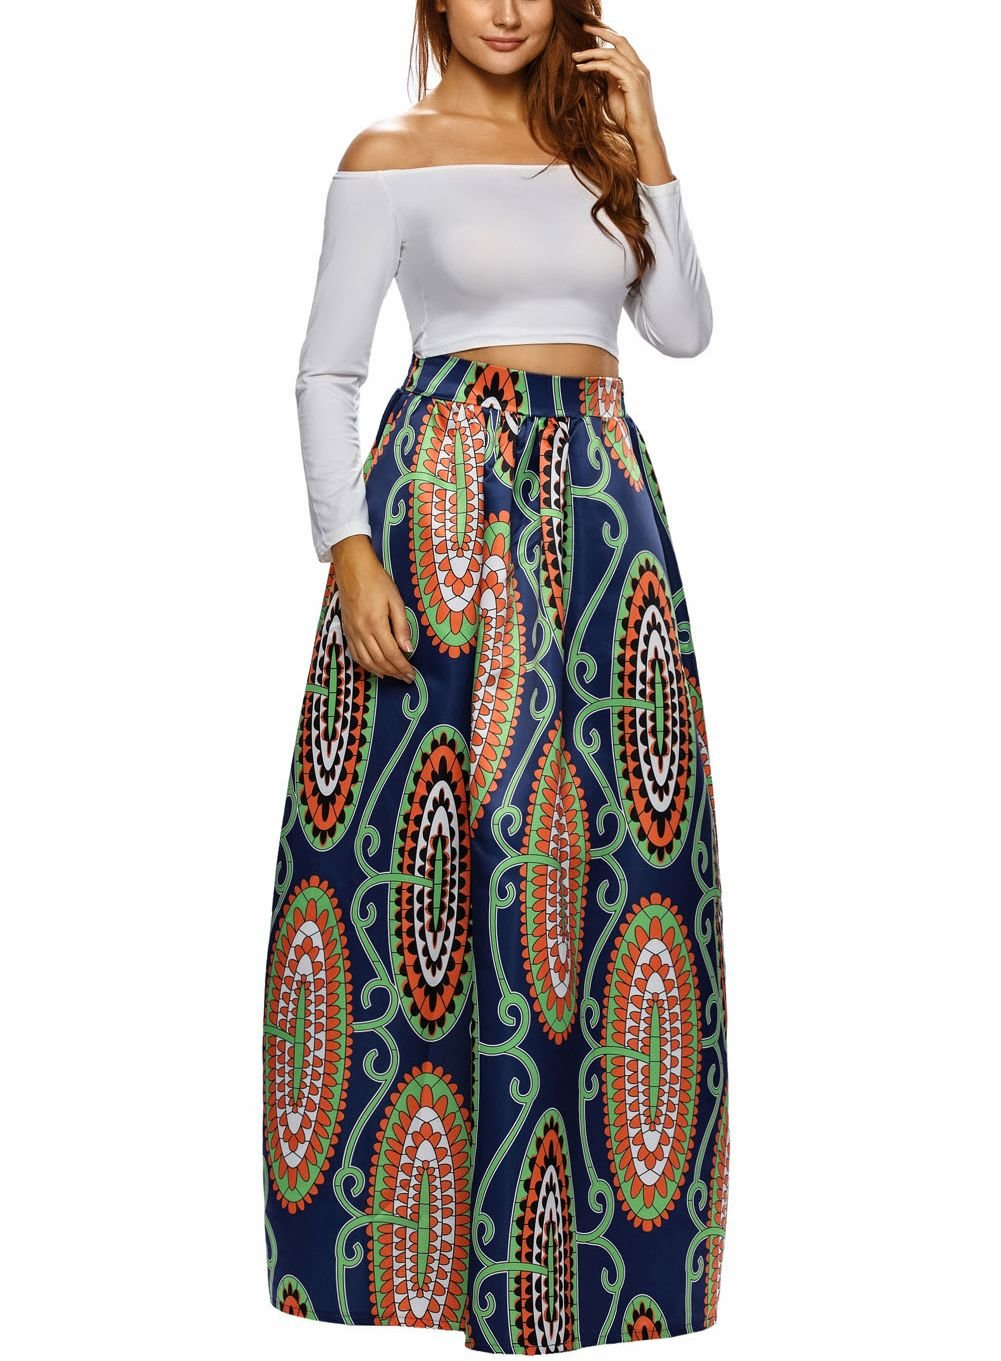 African Fancy Nails Quinceanera Nails Quinceañera Nails: Plus Size African Dresses: Amazon.com